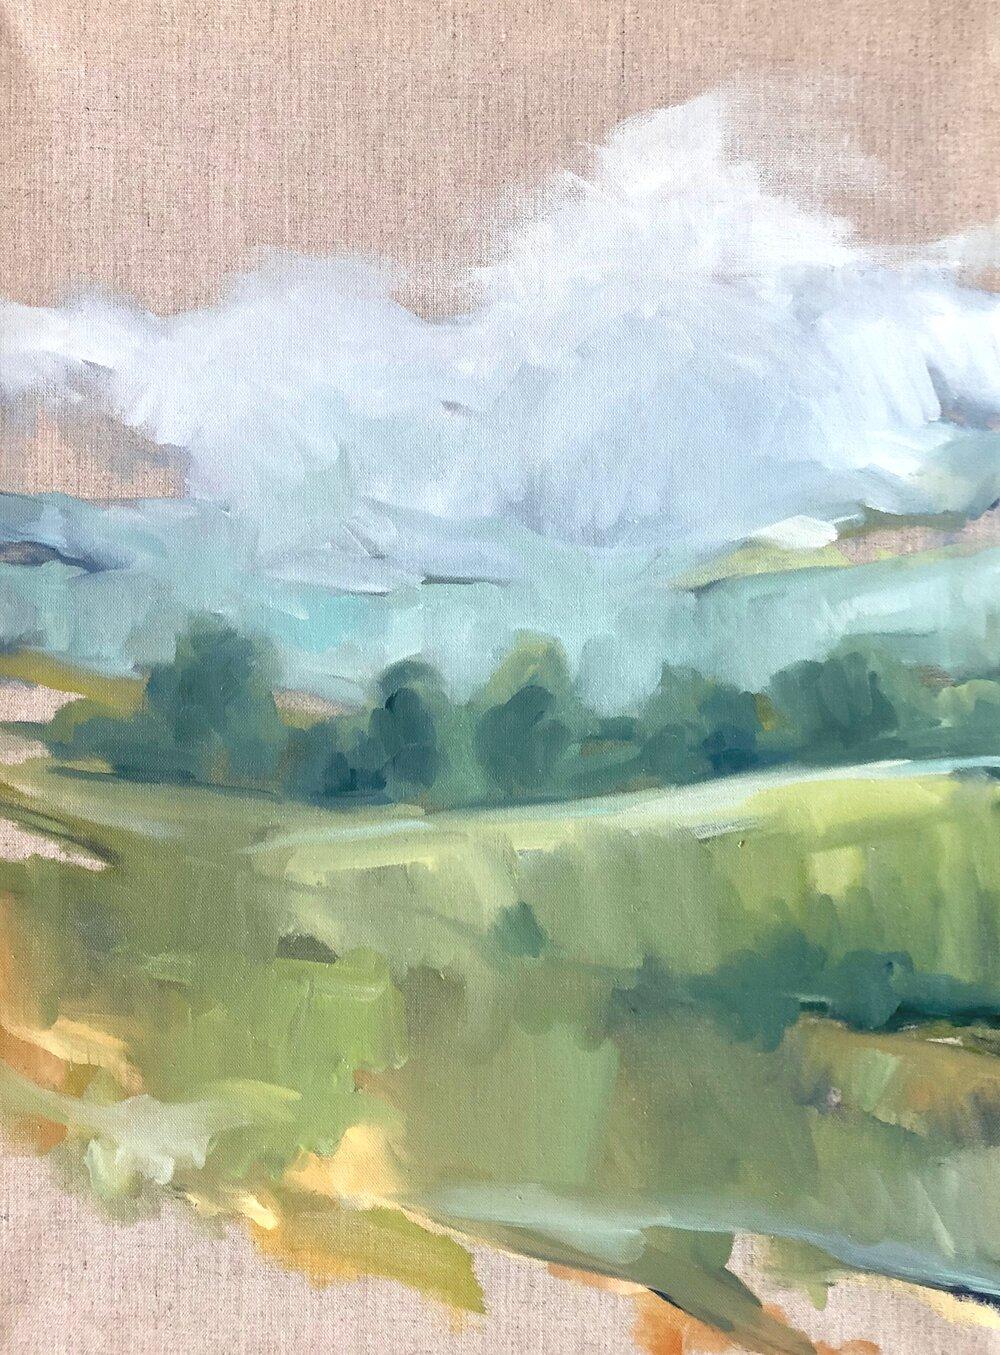 spring mist on linen